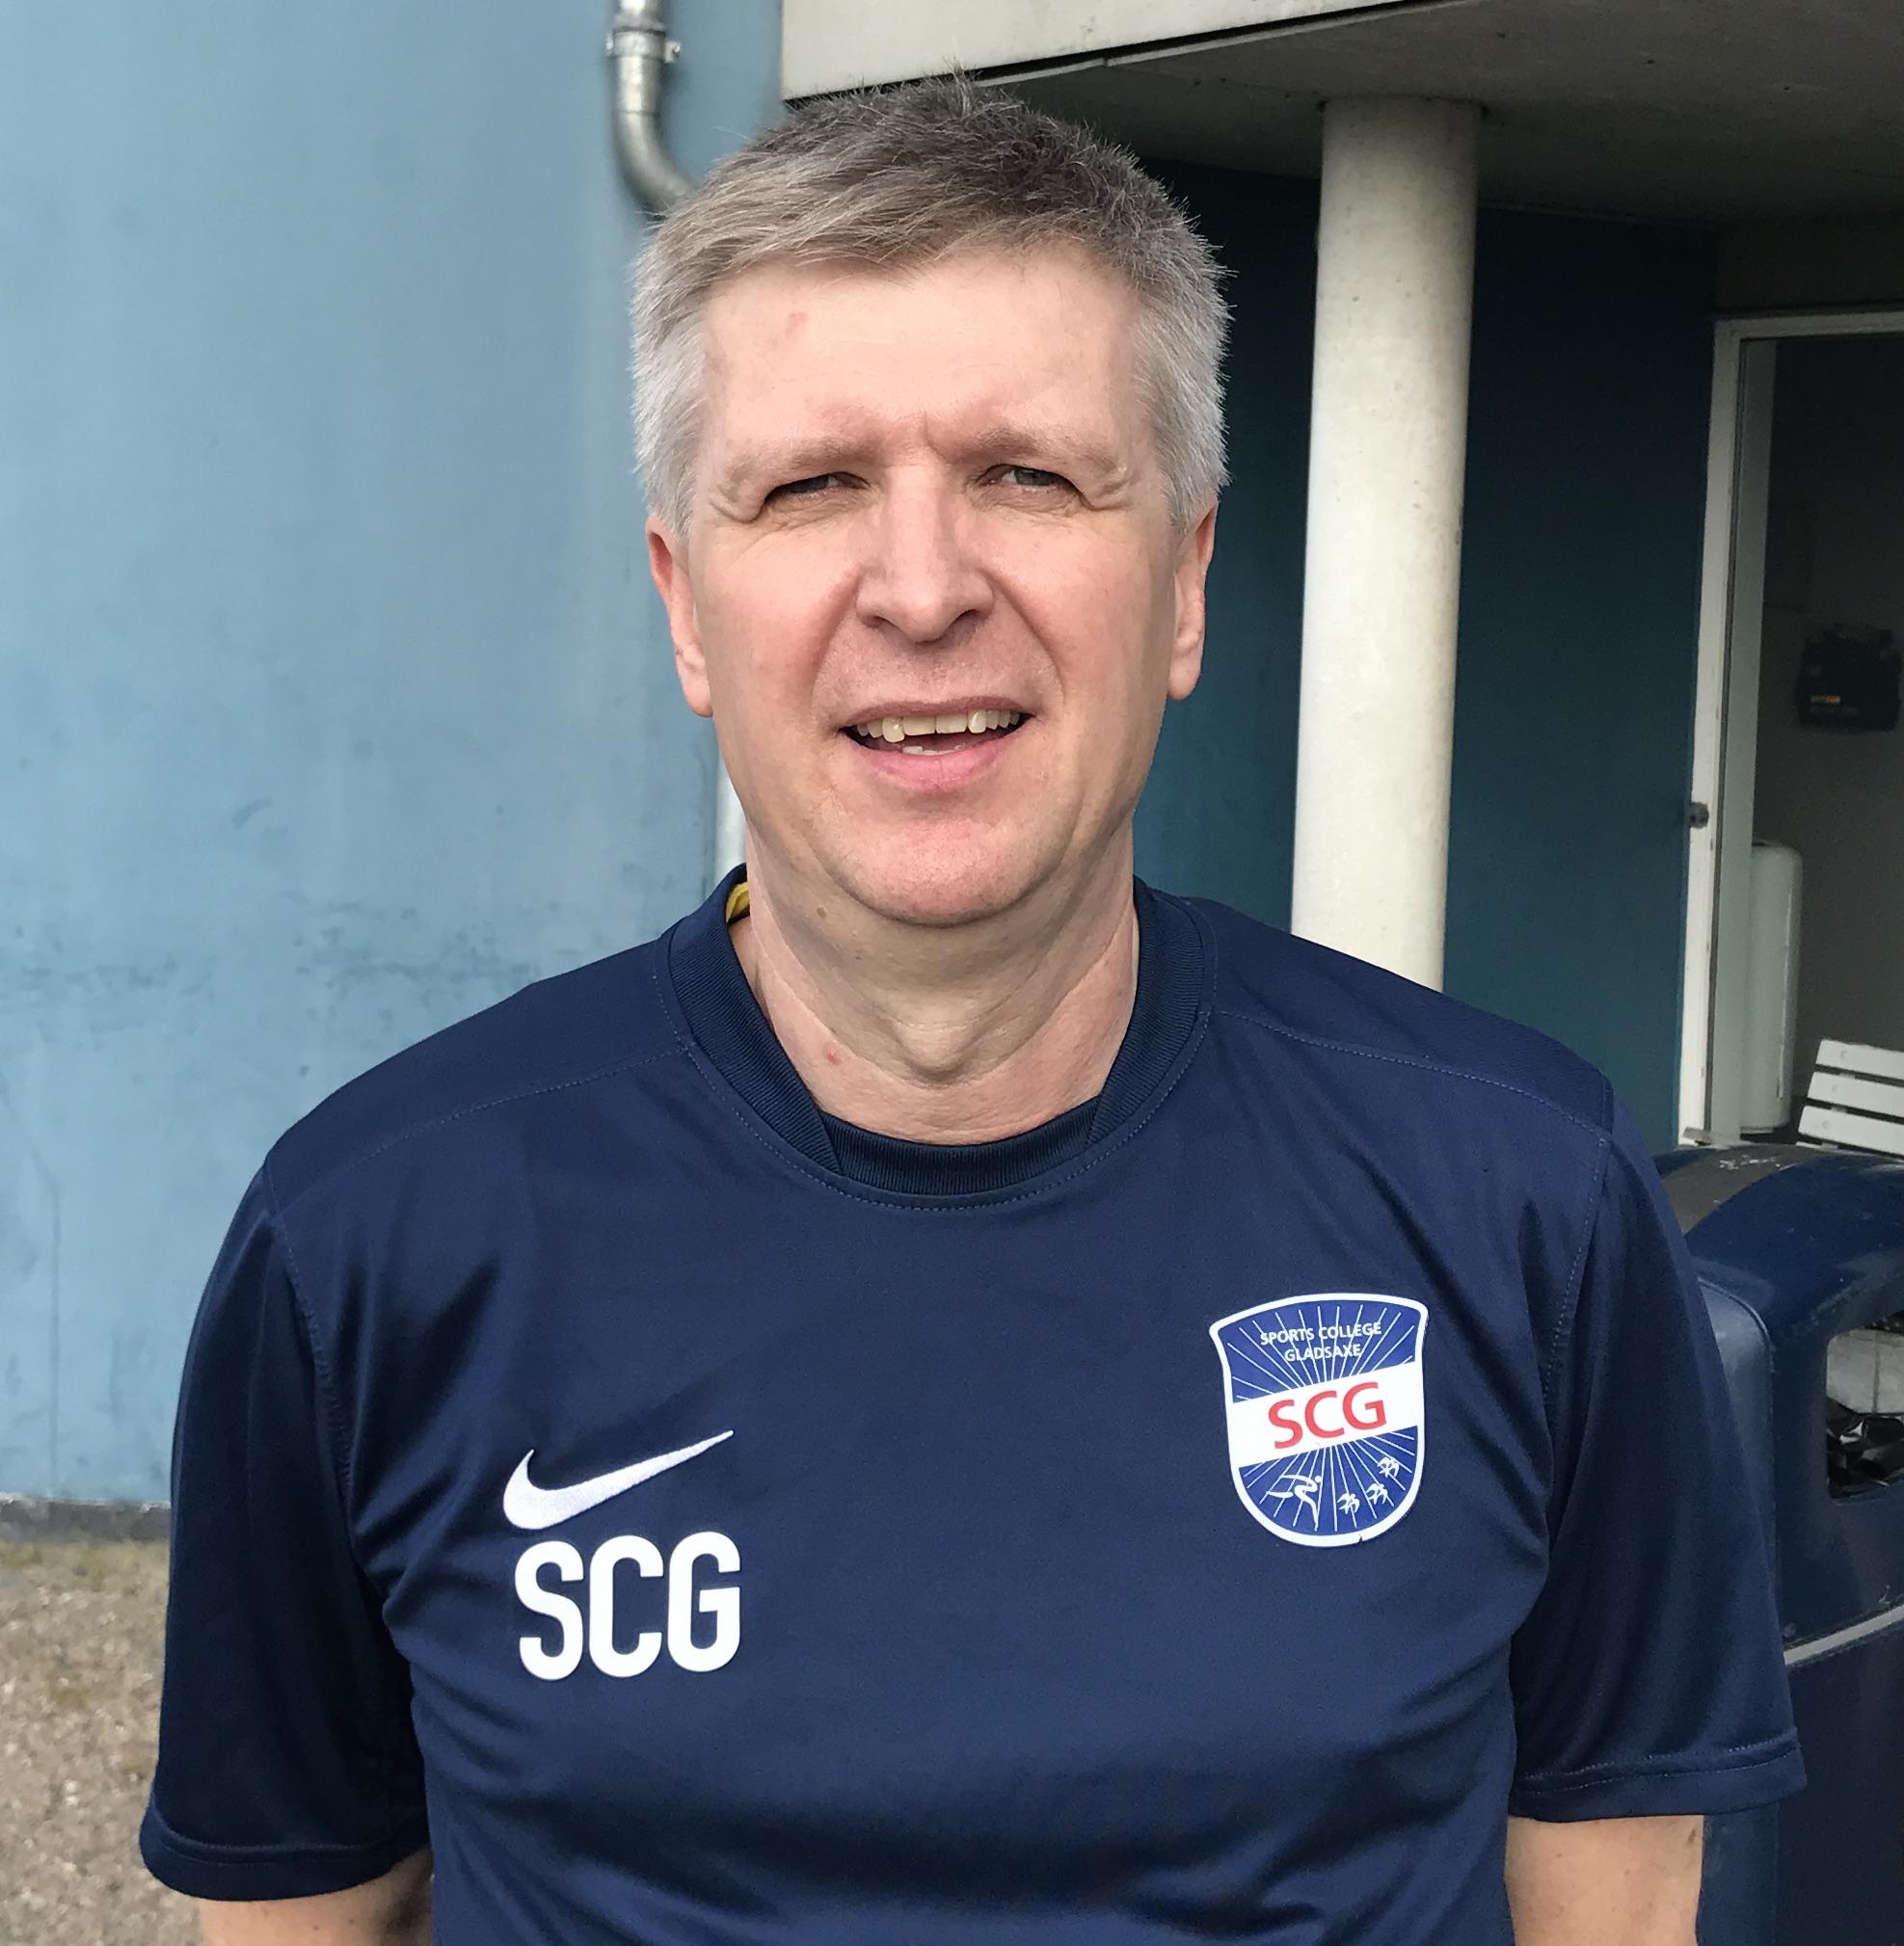 Peter Arvedsen